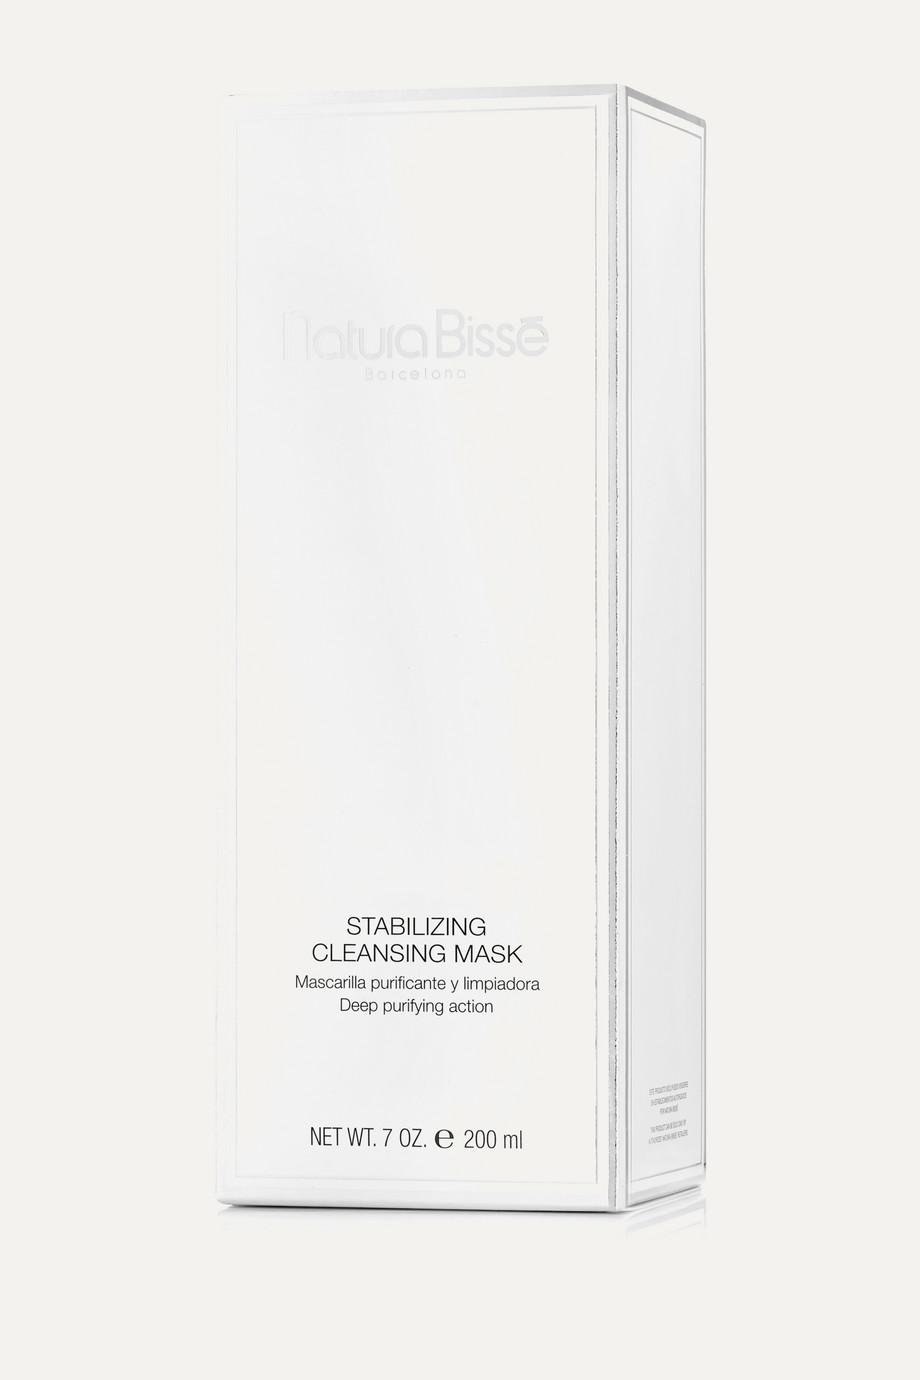 Natura Bissé Stabilizing Cleansing Mask, 200ml